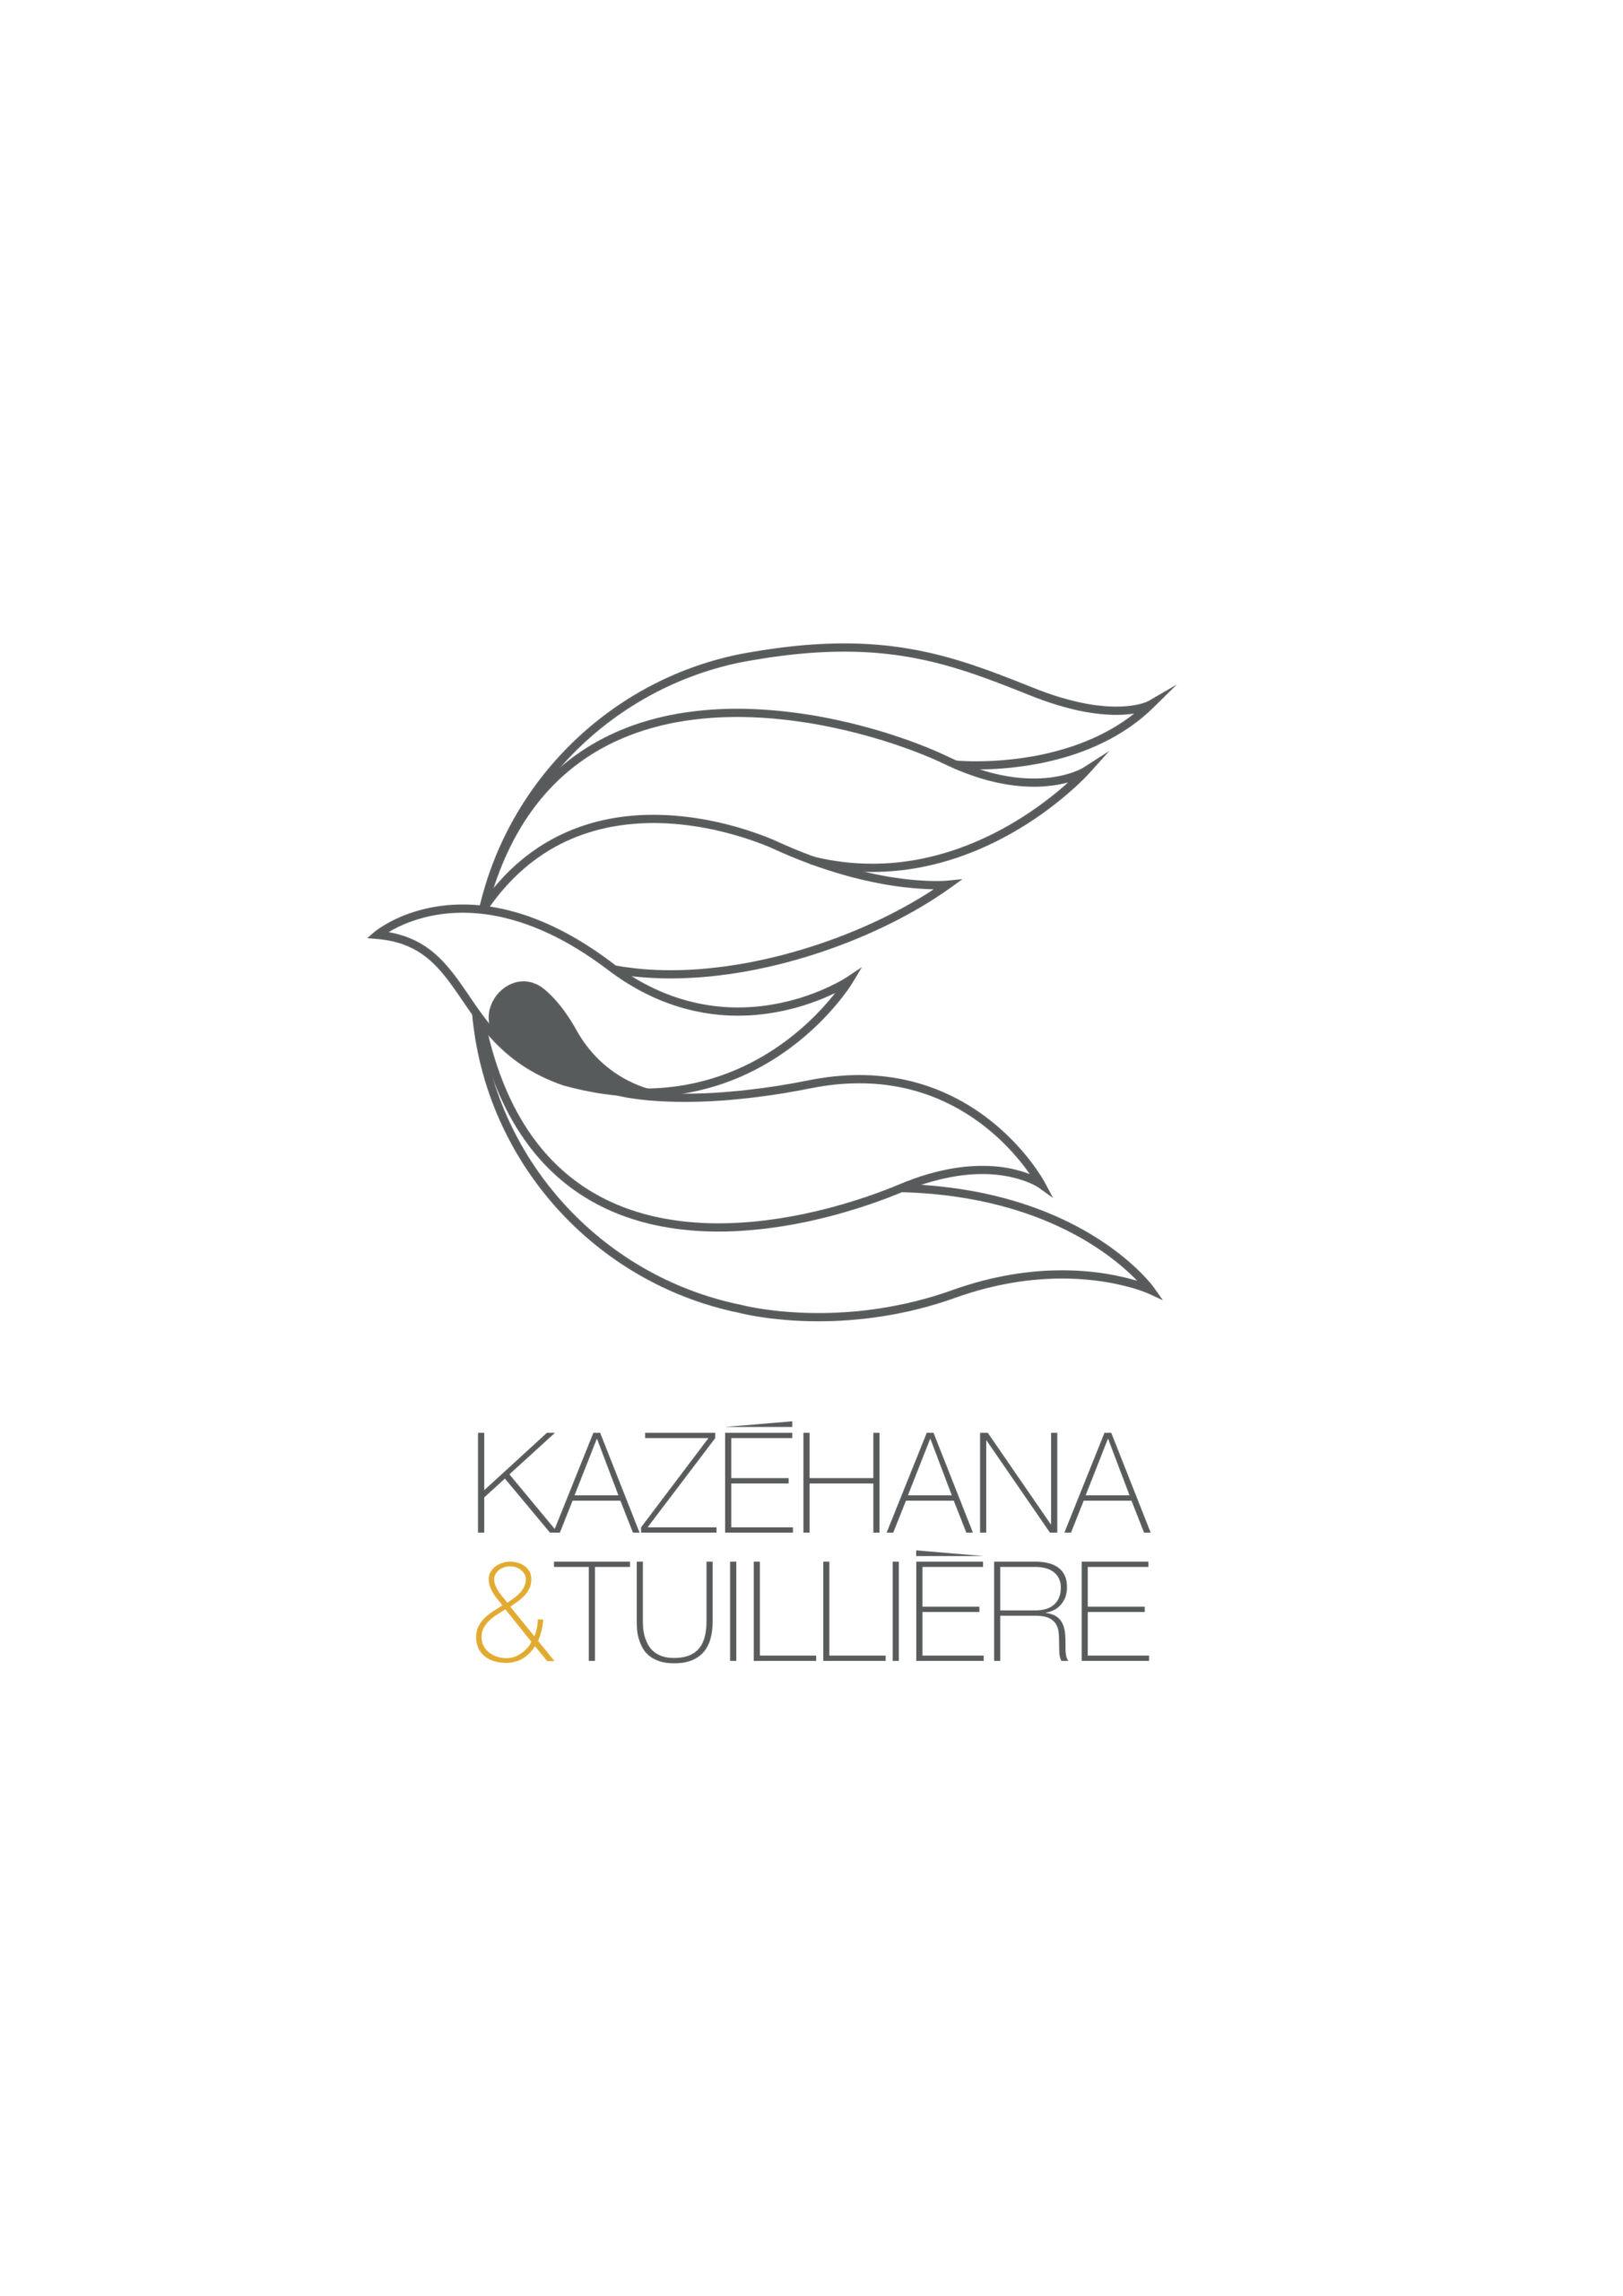 Kazéhana & Tuillière